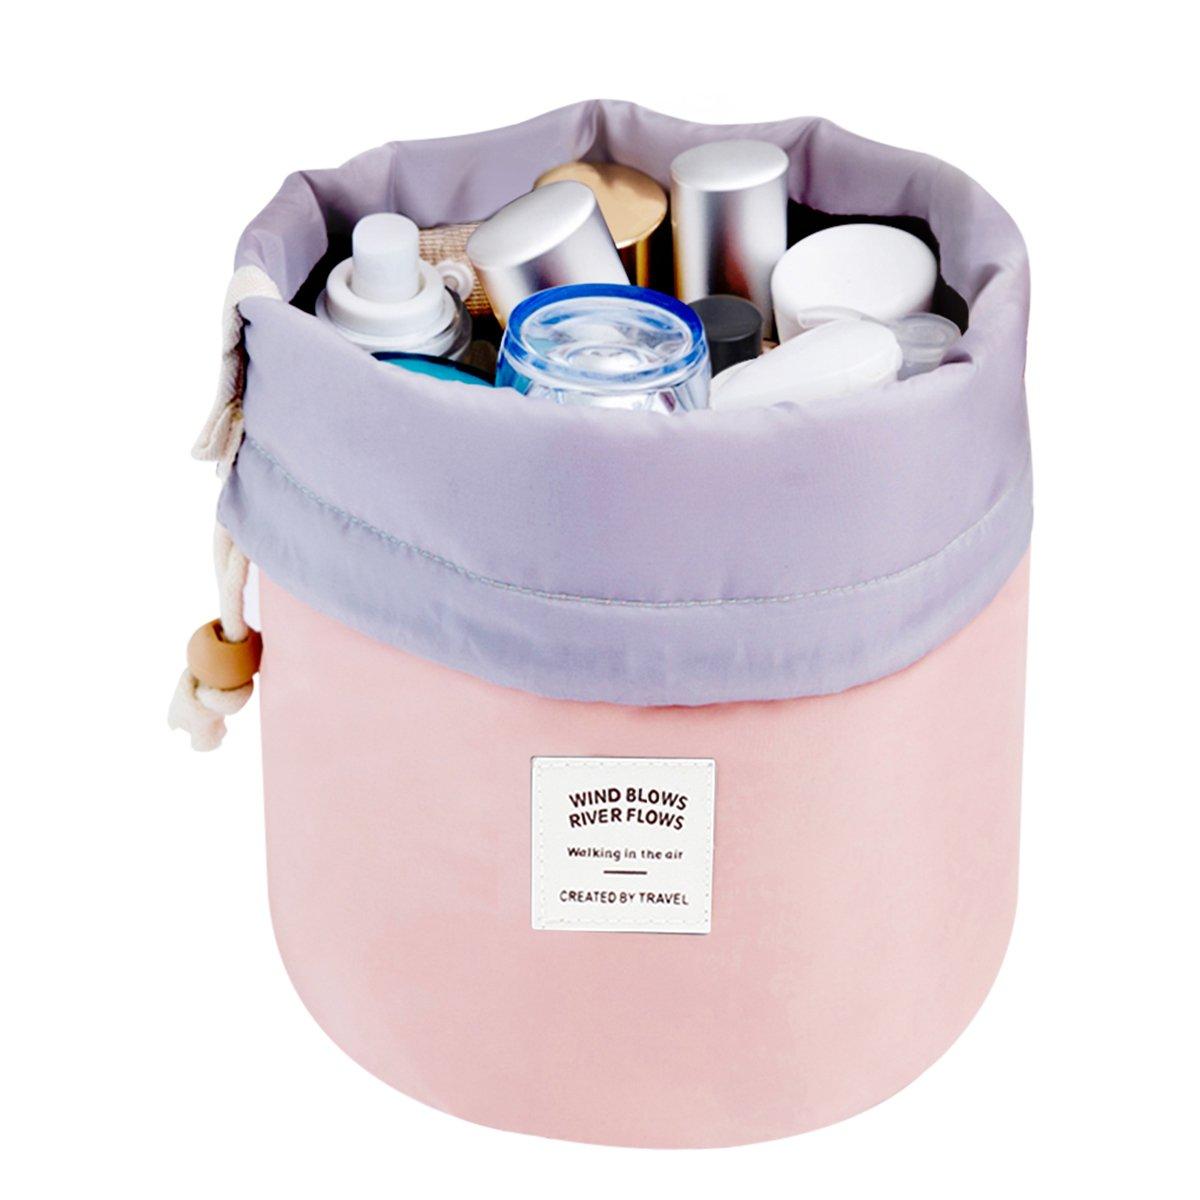 Mermaid Travel Make Up Bag Cosmetic Bags Organizer Women Girls Barrel Shaped Large Capacity Hanging Toiletry Wash Bags Drawstring Makeup Storage Bag + Small Pouch+Pvc Transparent Brush Bag (Pink) by Amazon